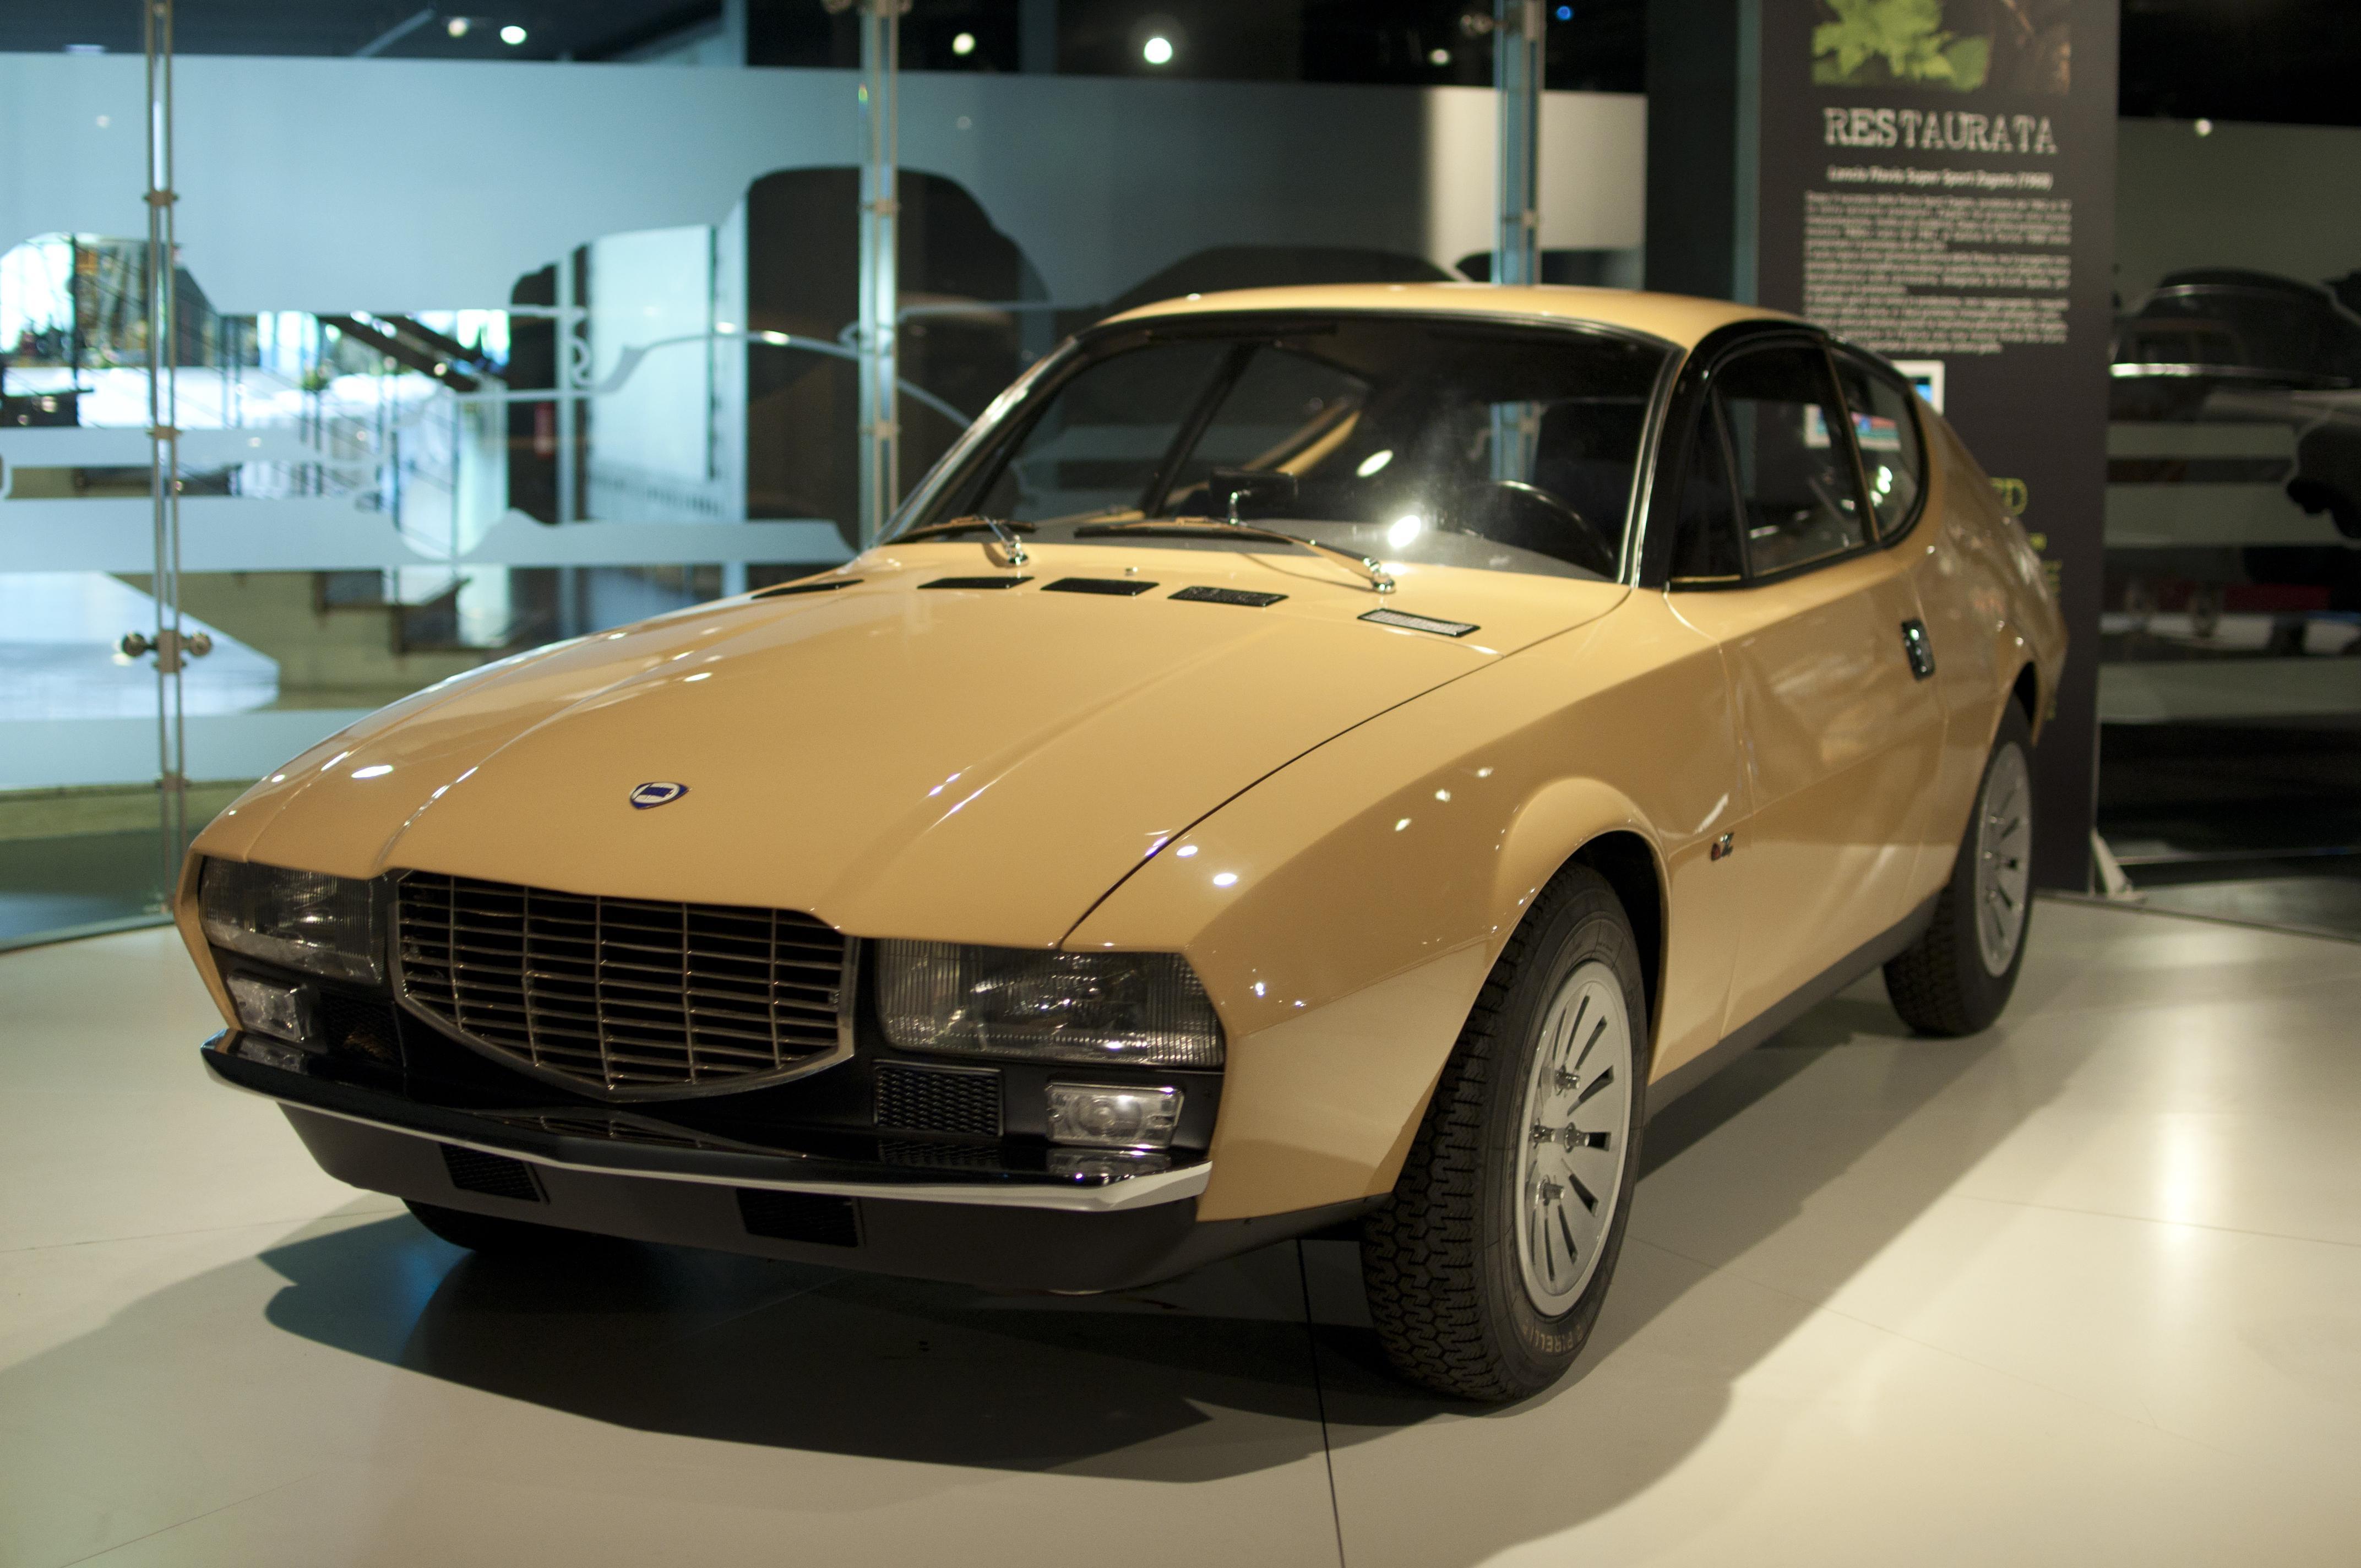 https://upload.wikimedia.org/wikipedia/commons/d/dc/Lancia_Flavia_Super_Sport_%2818095192871%29.jpg